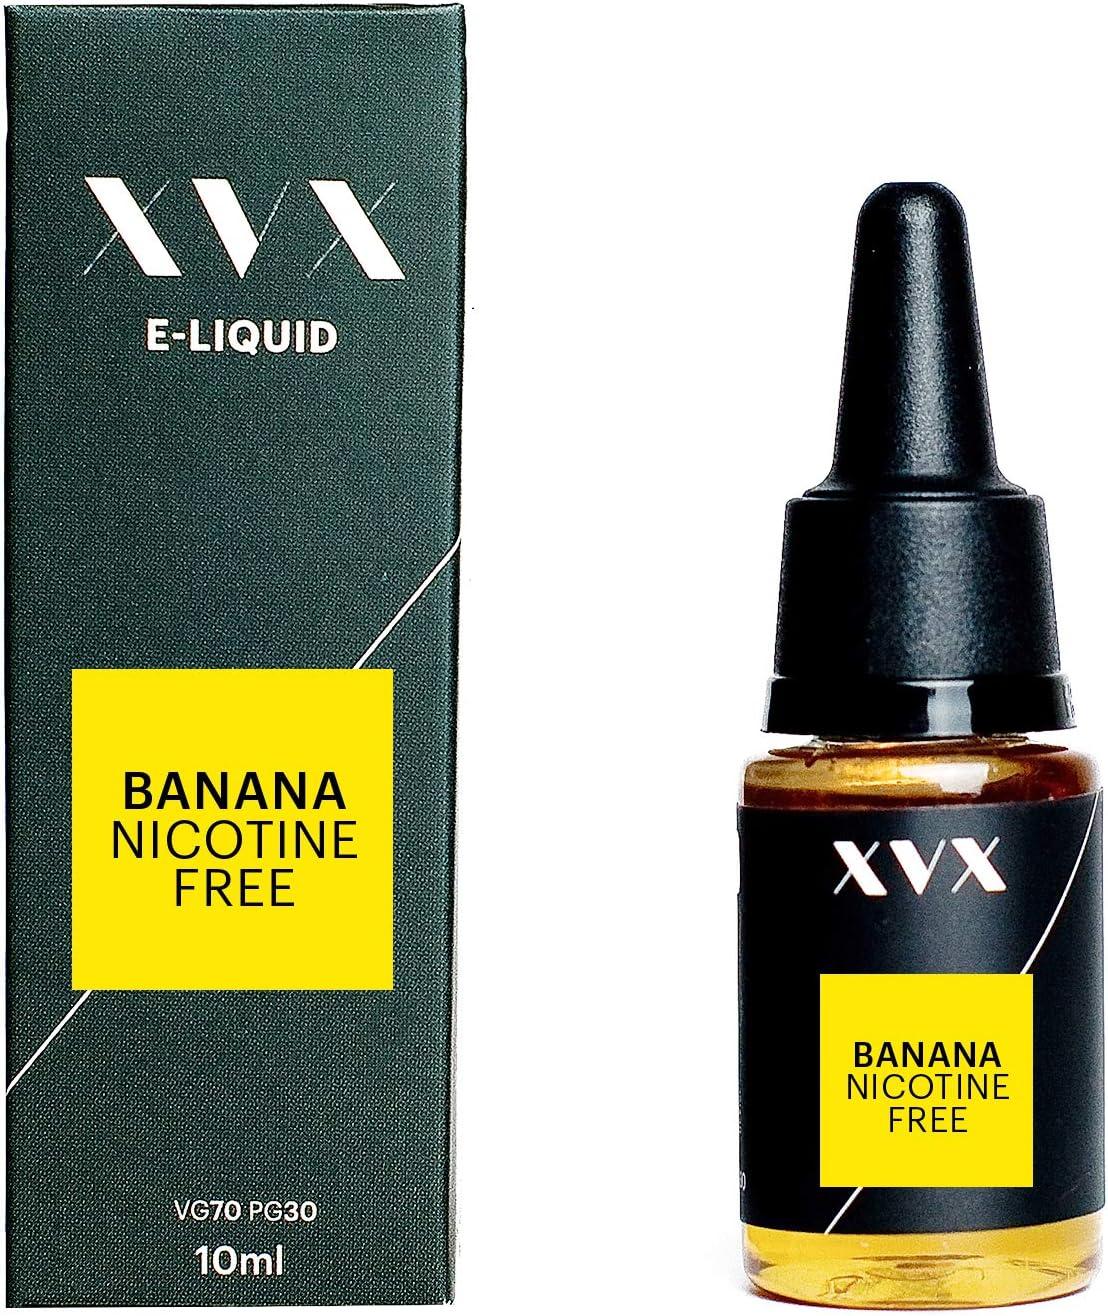 XVX E Liquid Banana Flavour Electronic Liquid For Vape Pen Cigarettes E Cigarette Shisha Vapouriser Liquid 10ml Nicotine Free Bottle Needle Tip Ecig E Cig